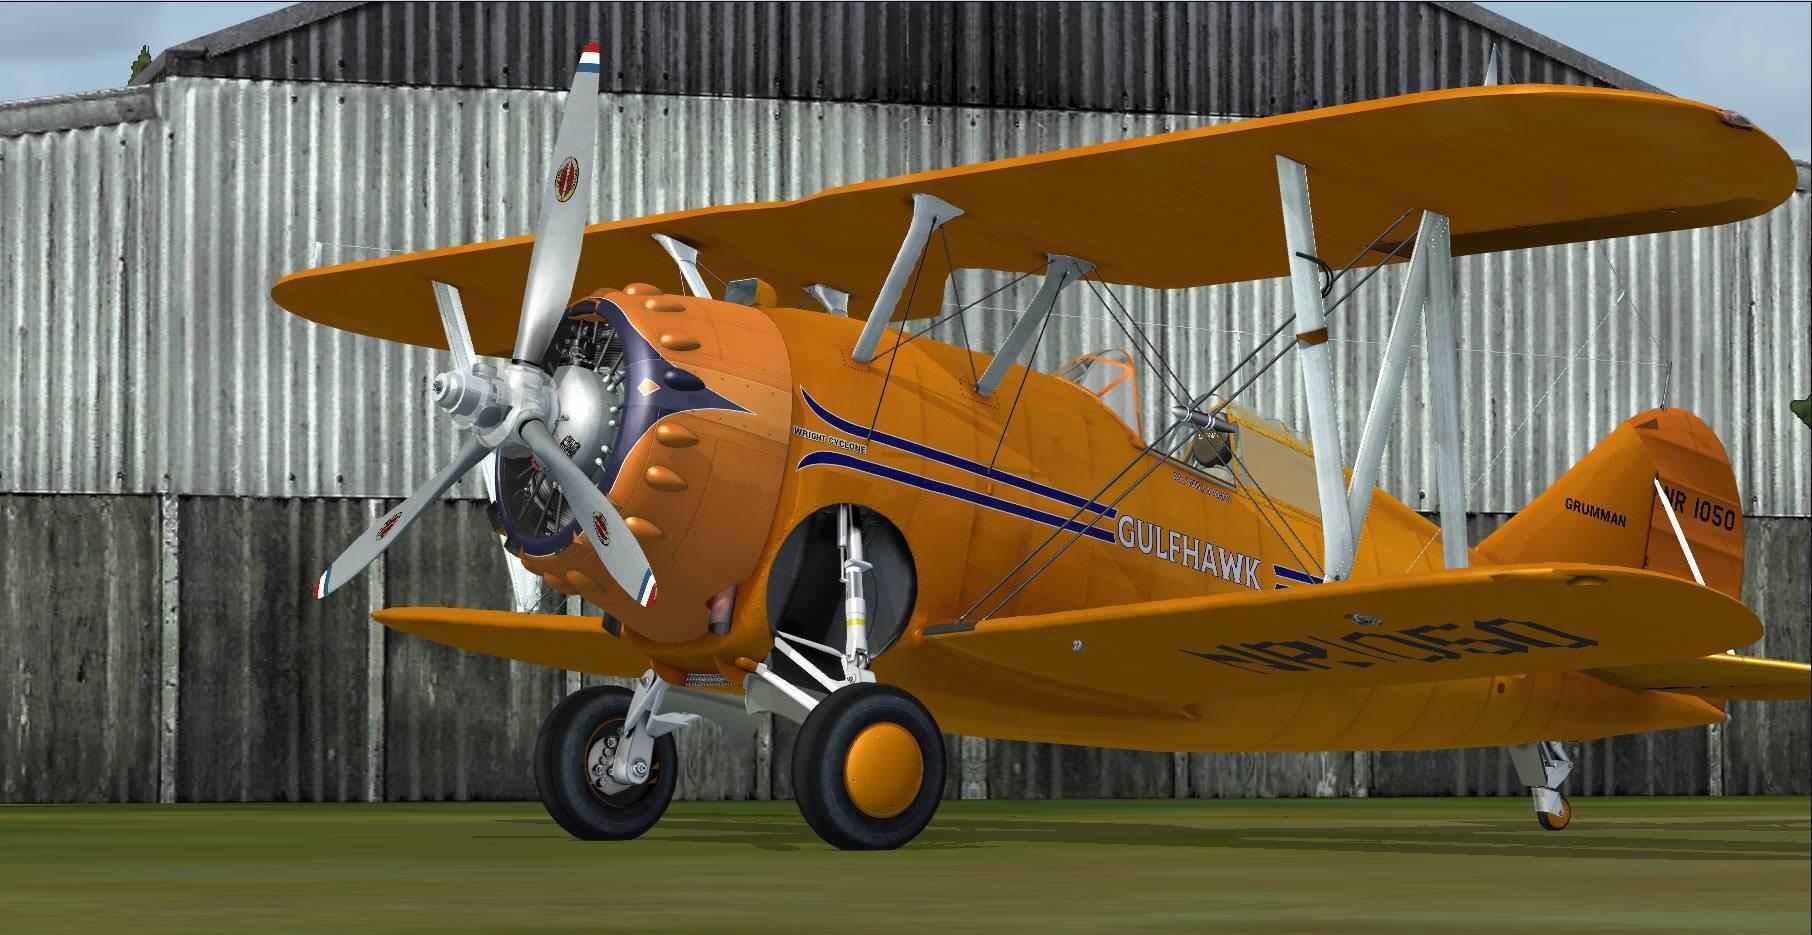 Gulfhawk%20II%207-01.jpg